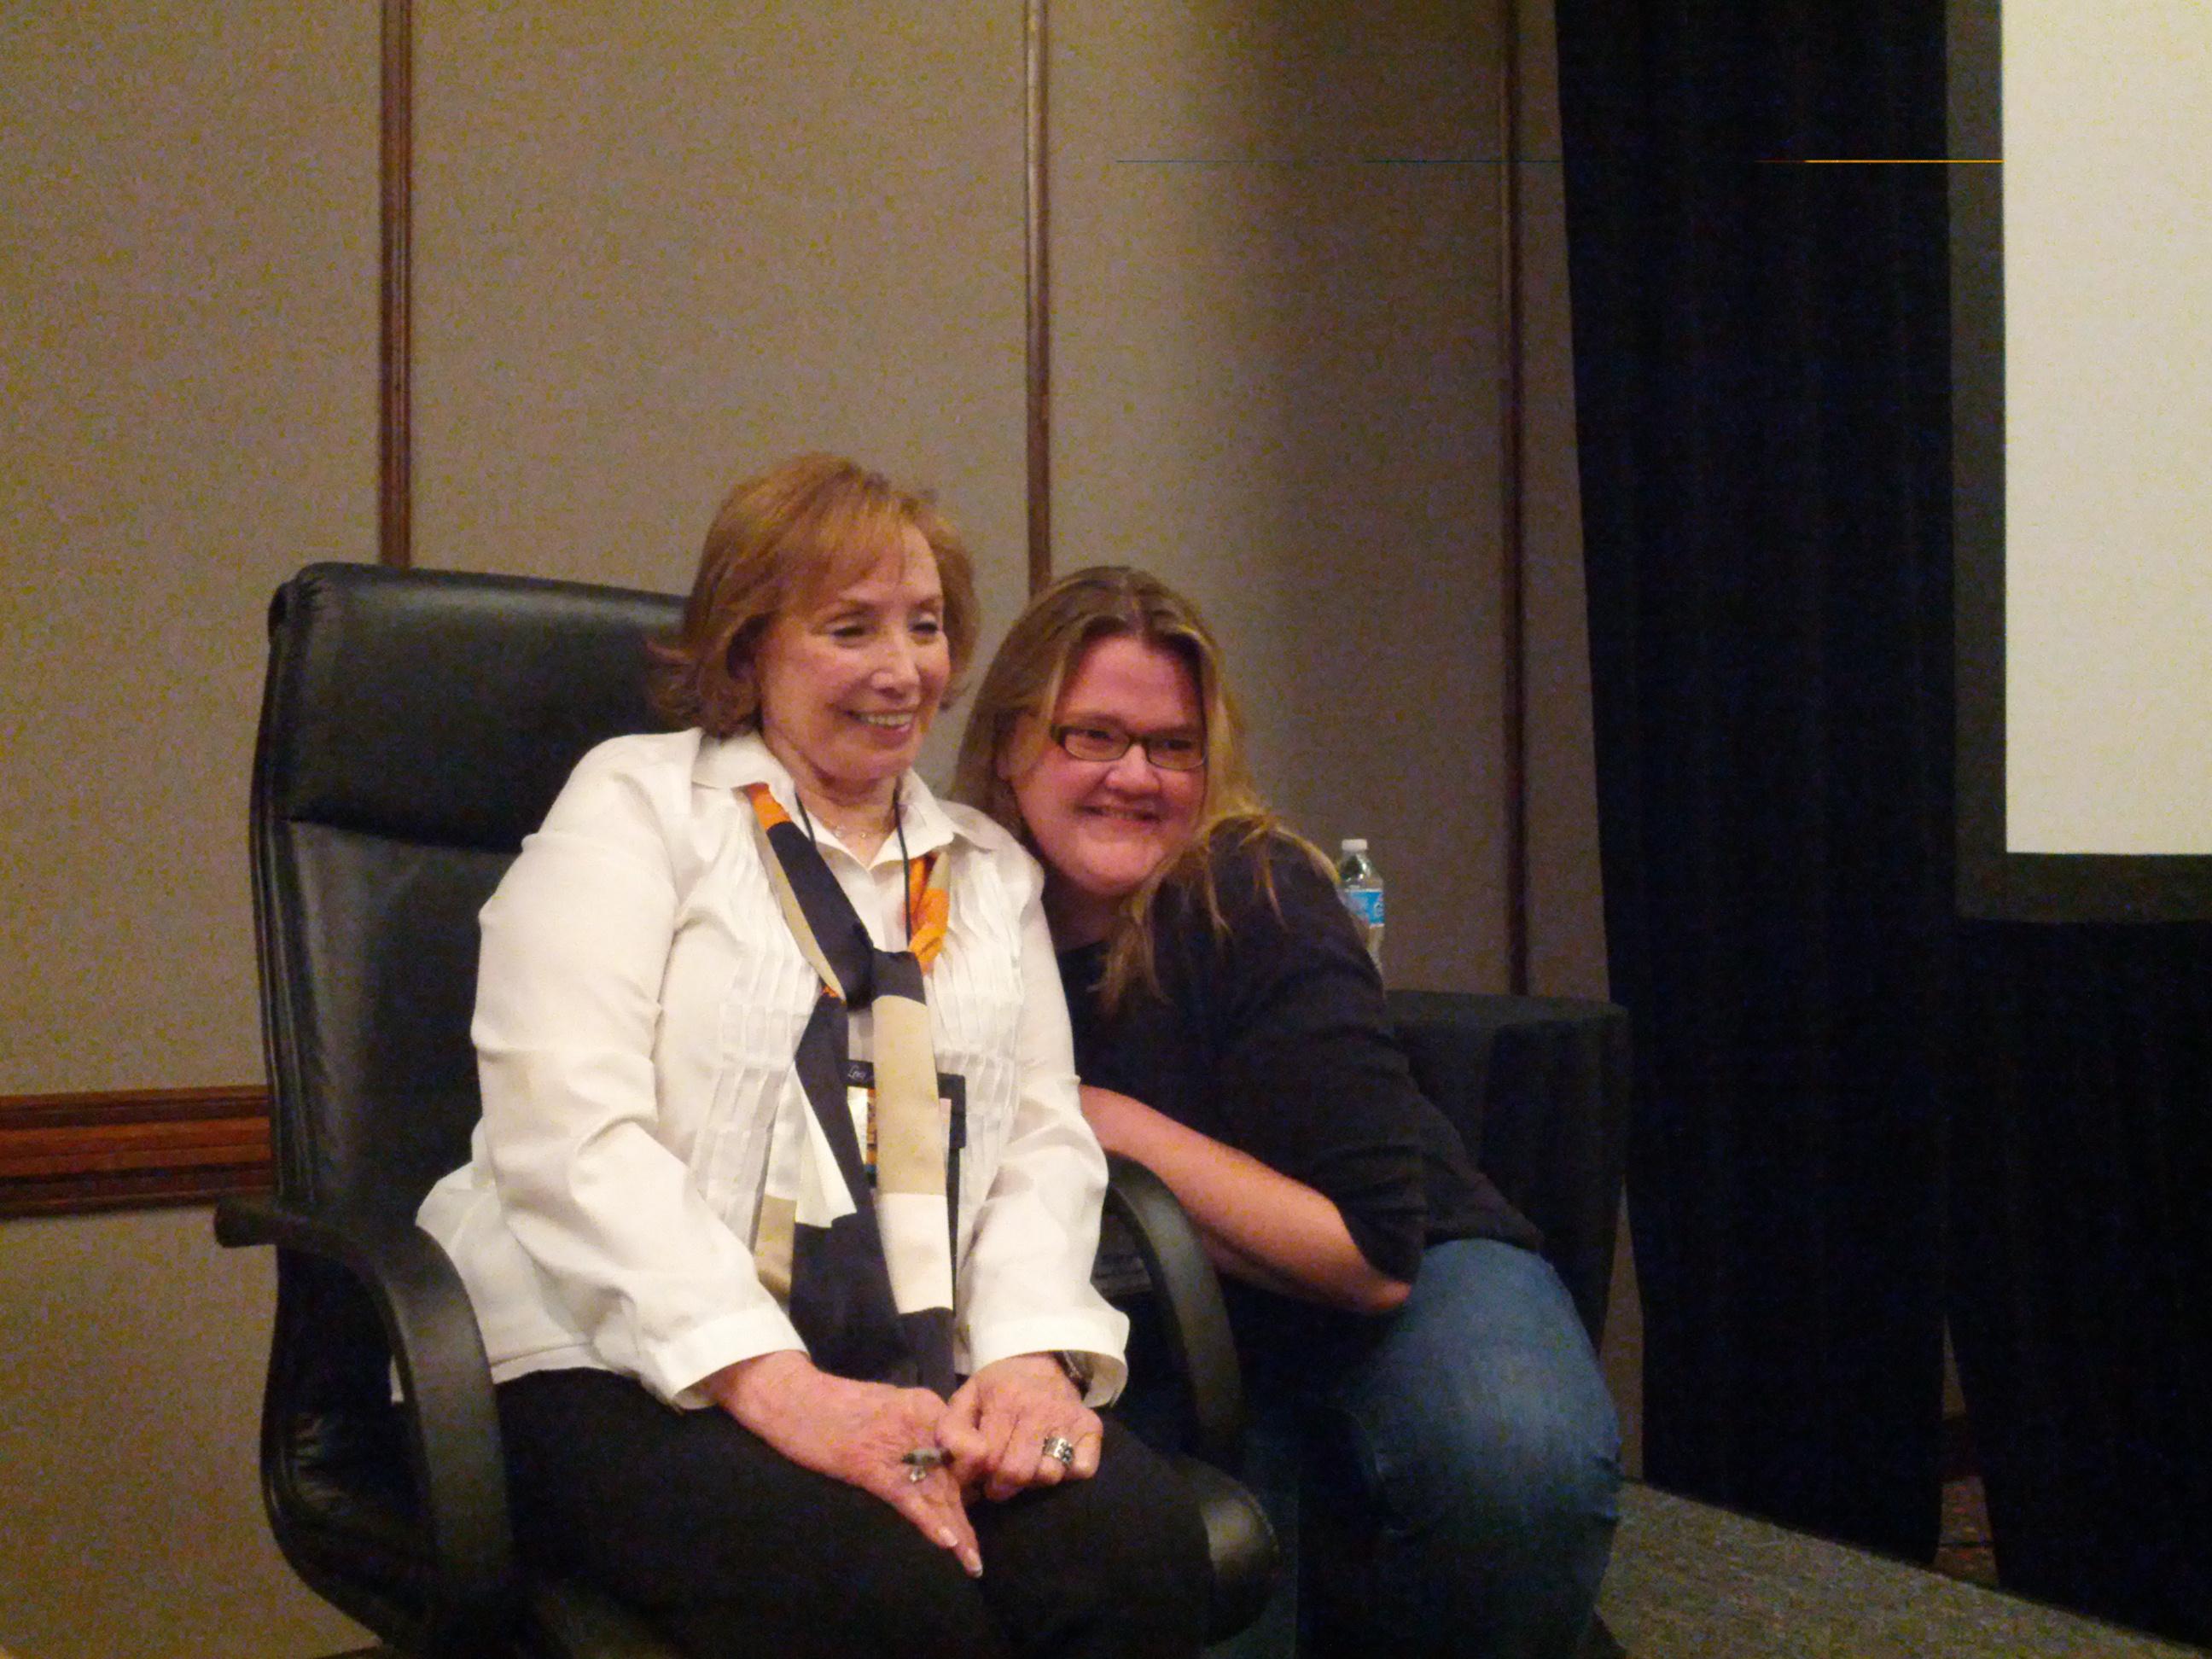 A slightly verklempt Sarah MacLean and Julie Garwood